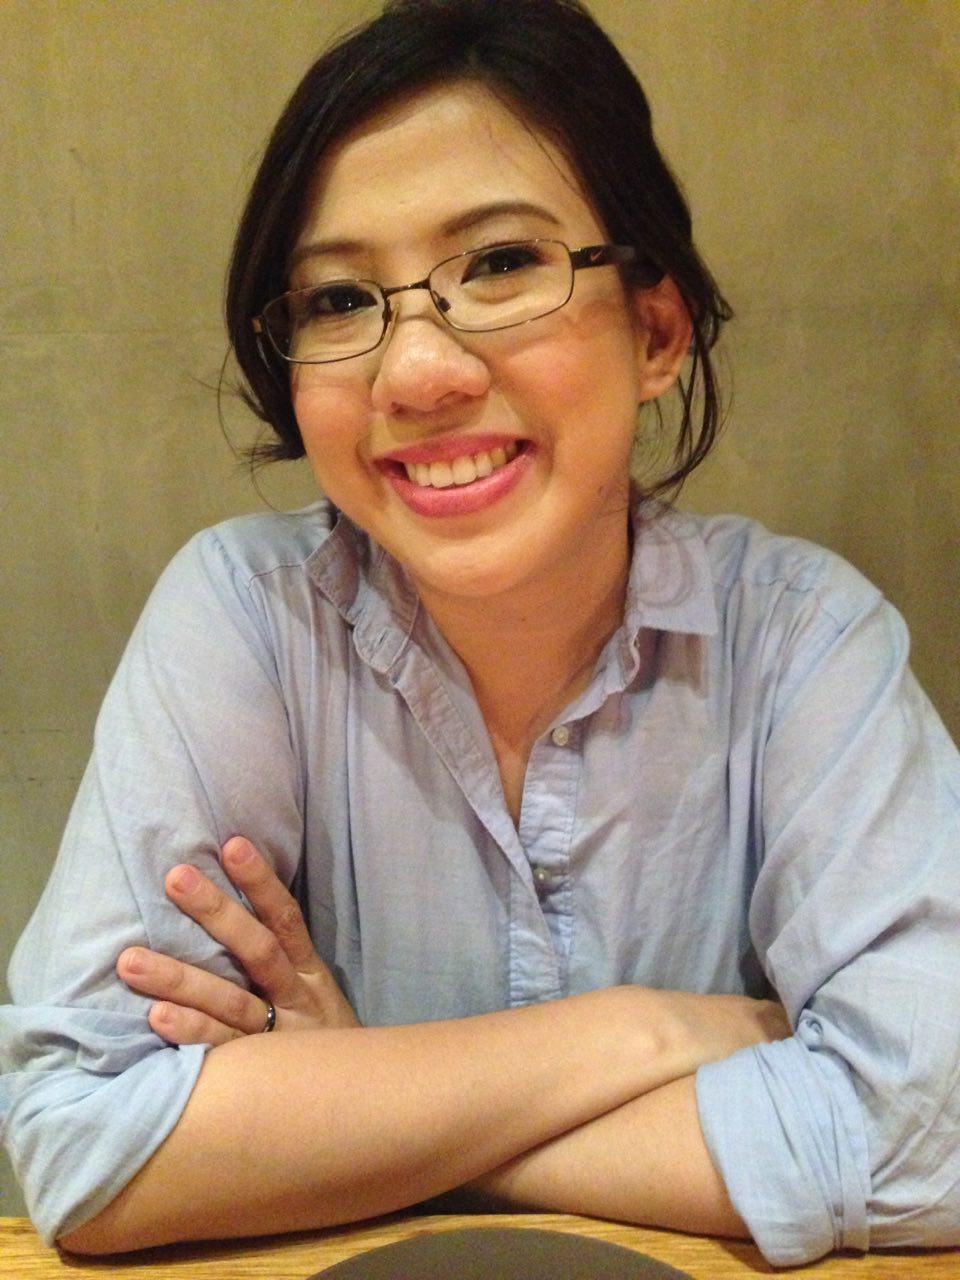 Luna Javier: Inspiring Diversity in Games